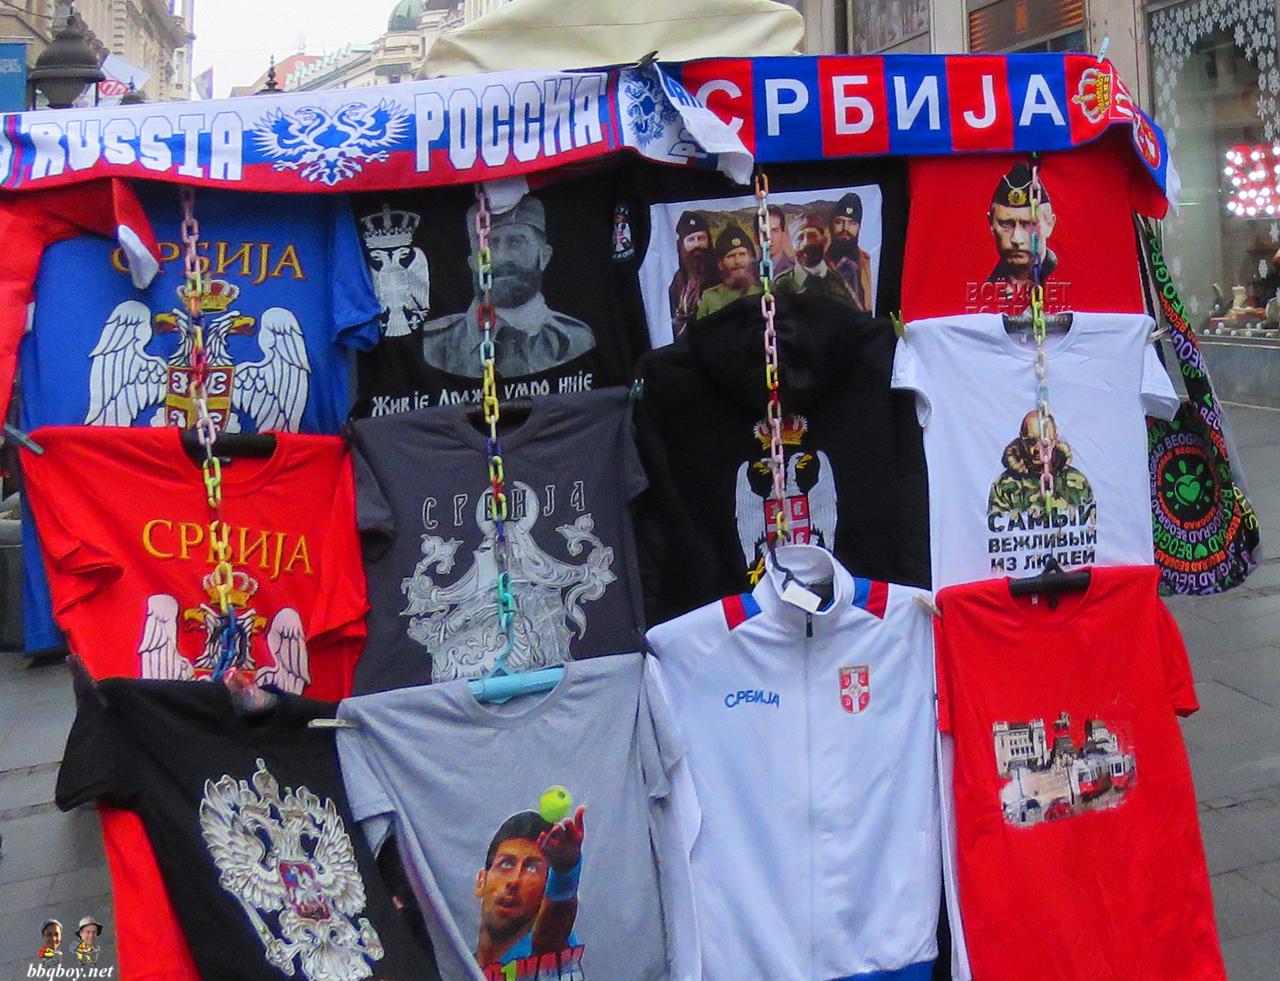 belgrade-serbia-russia-ties